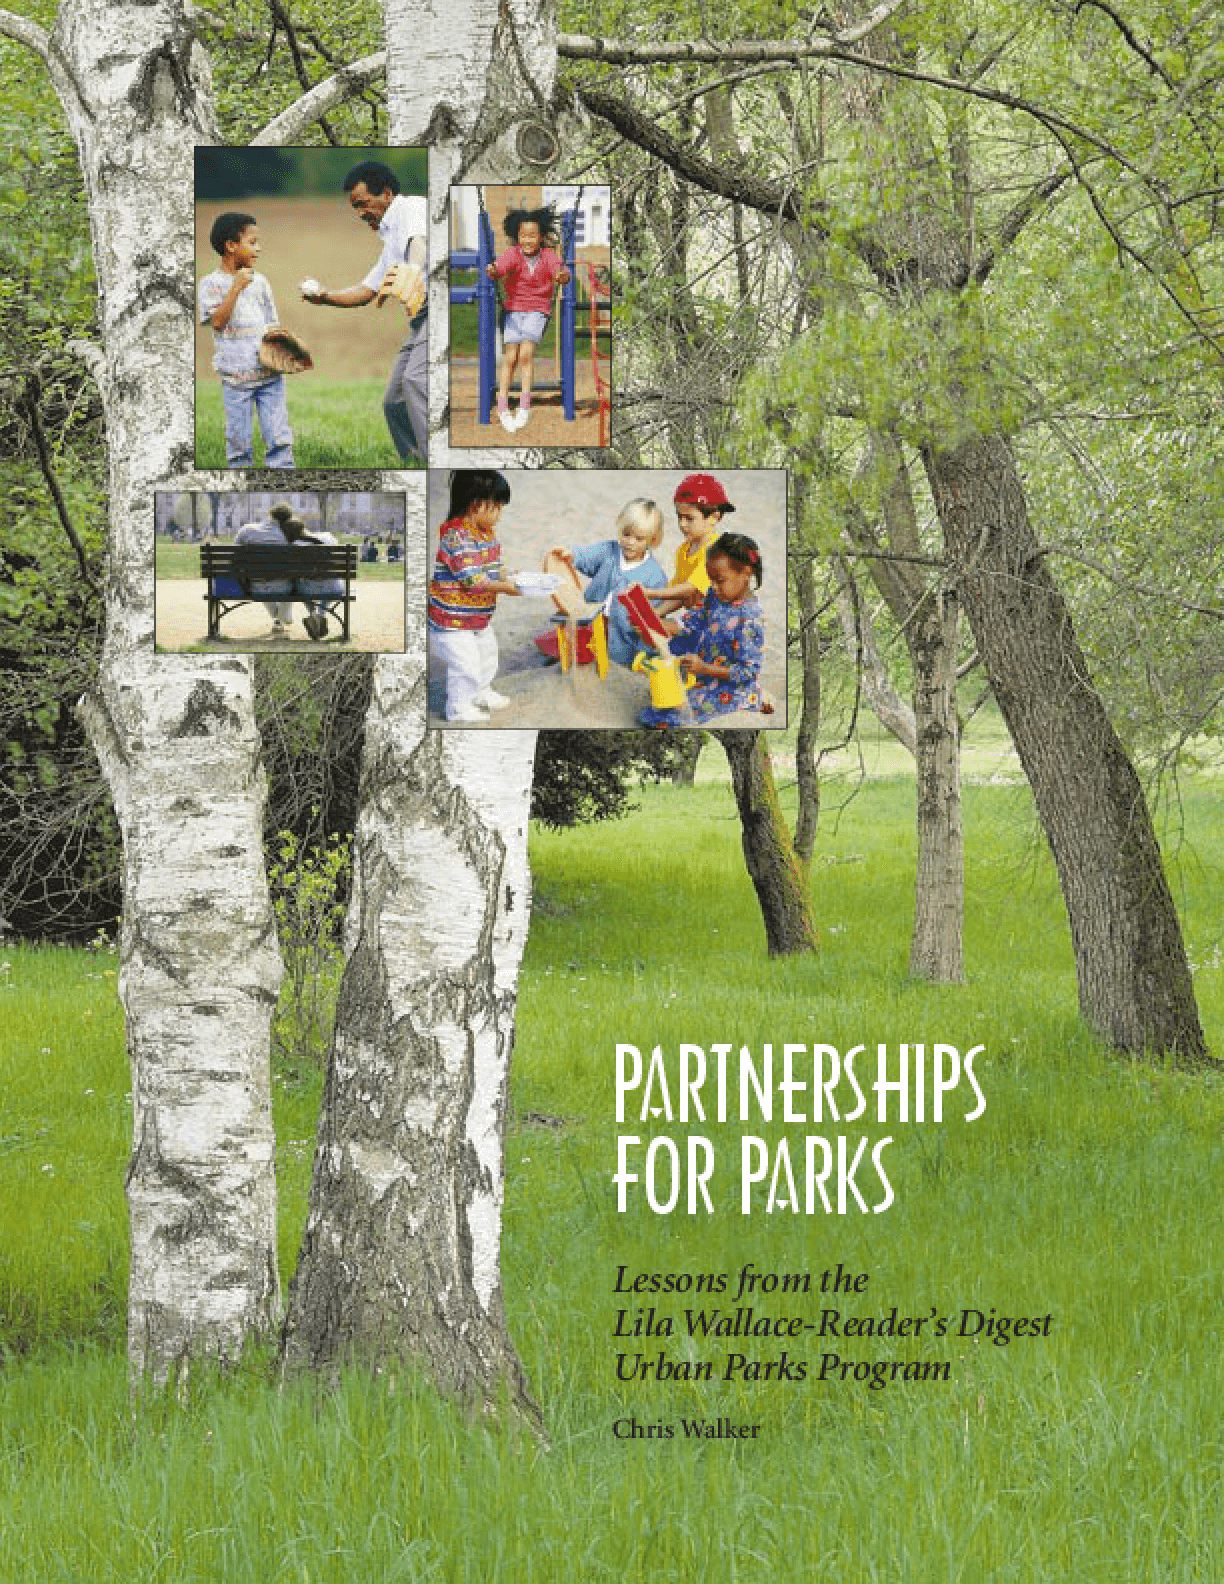 Partnerships for Parks